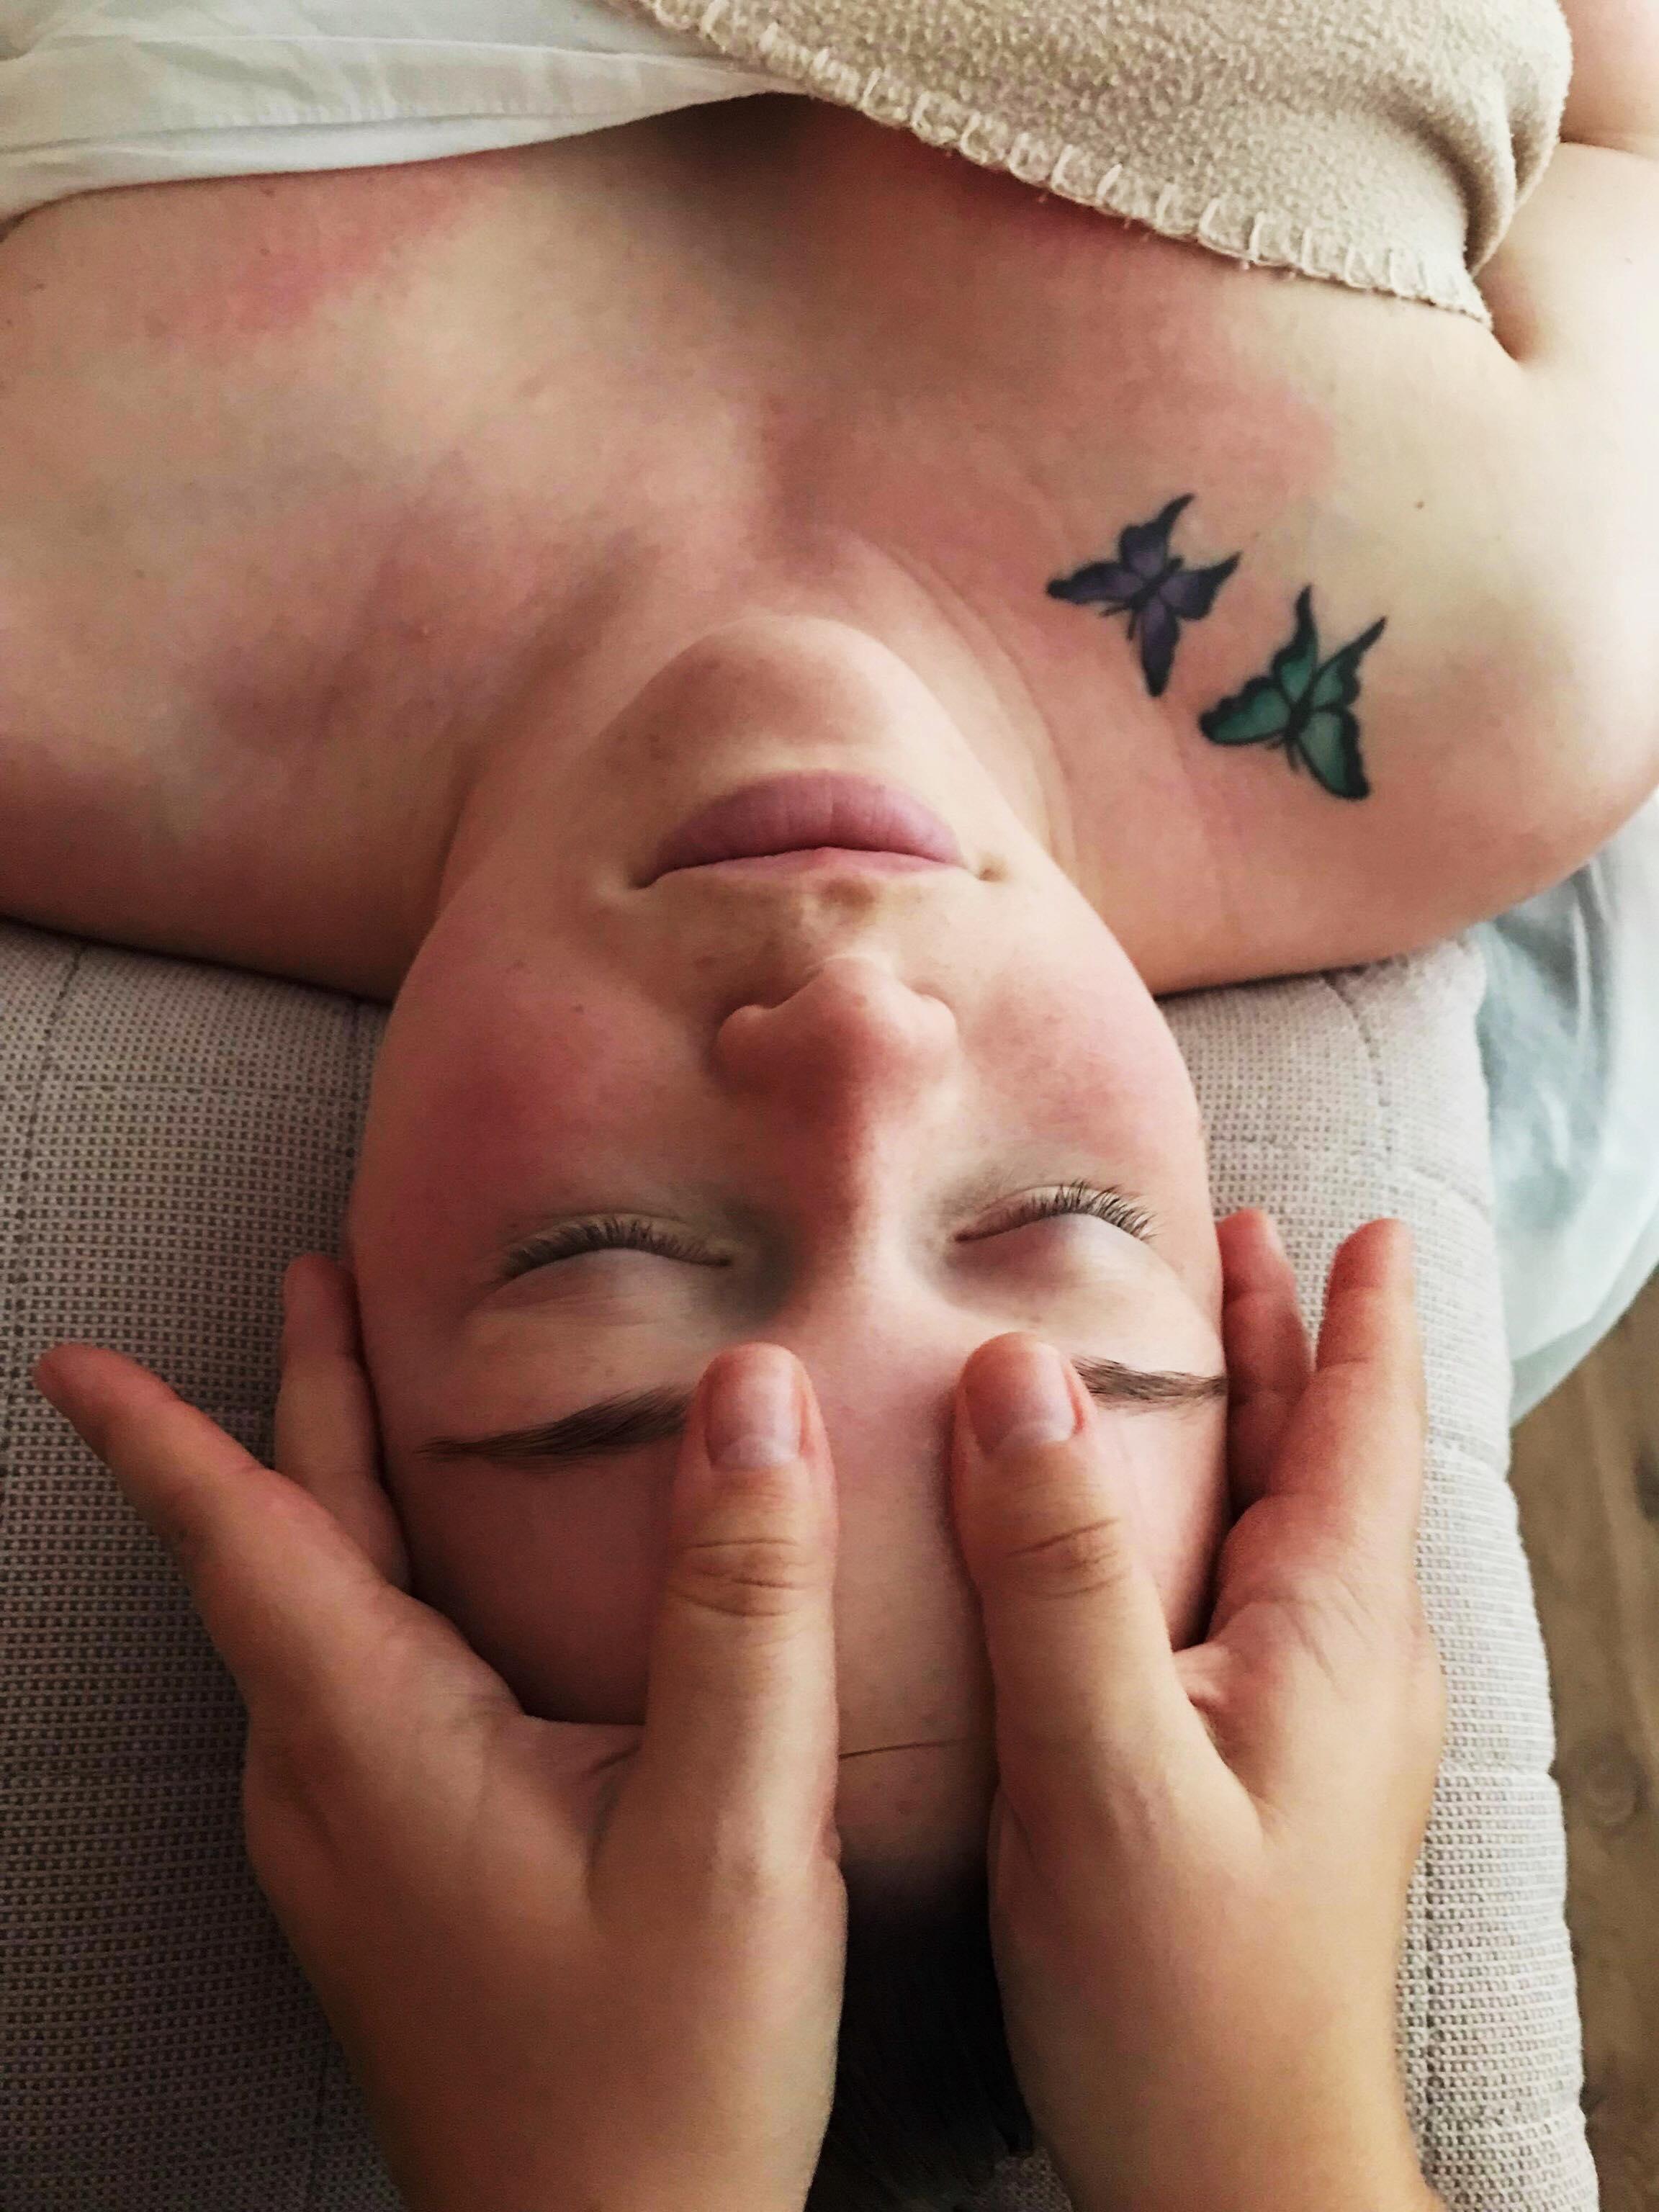 massage frederiksberg godthåbsvej